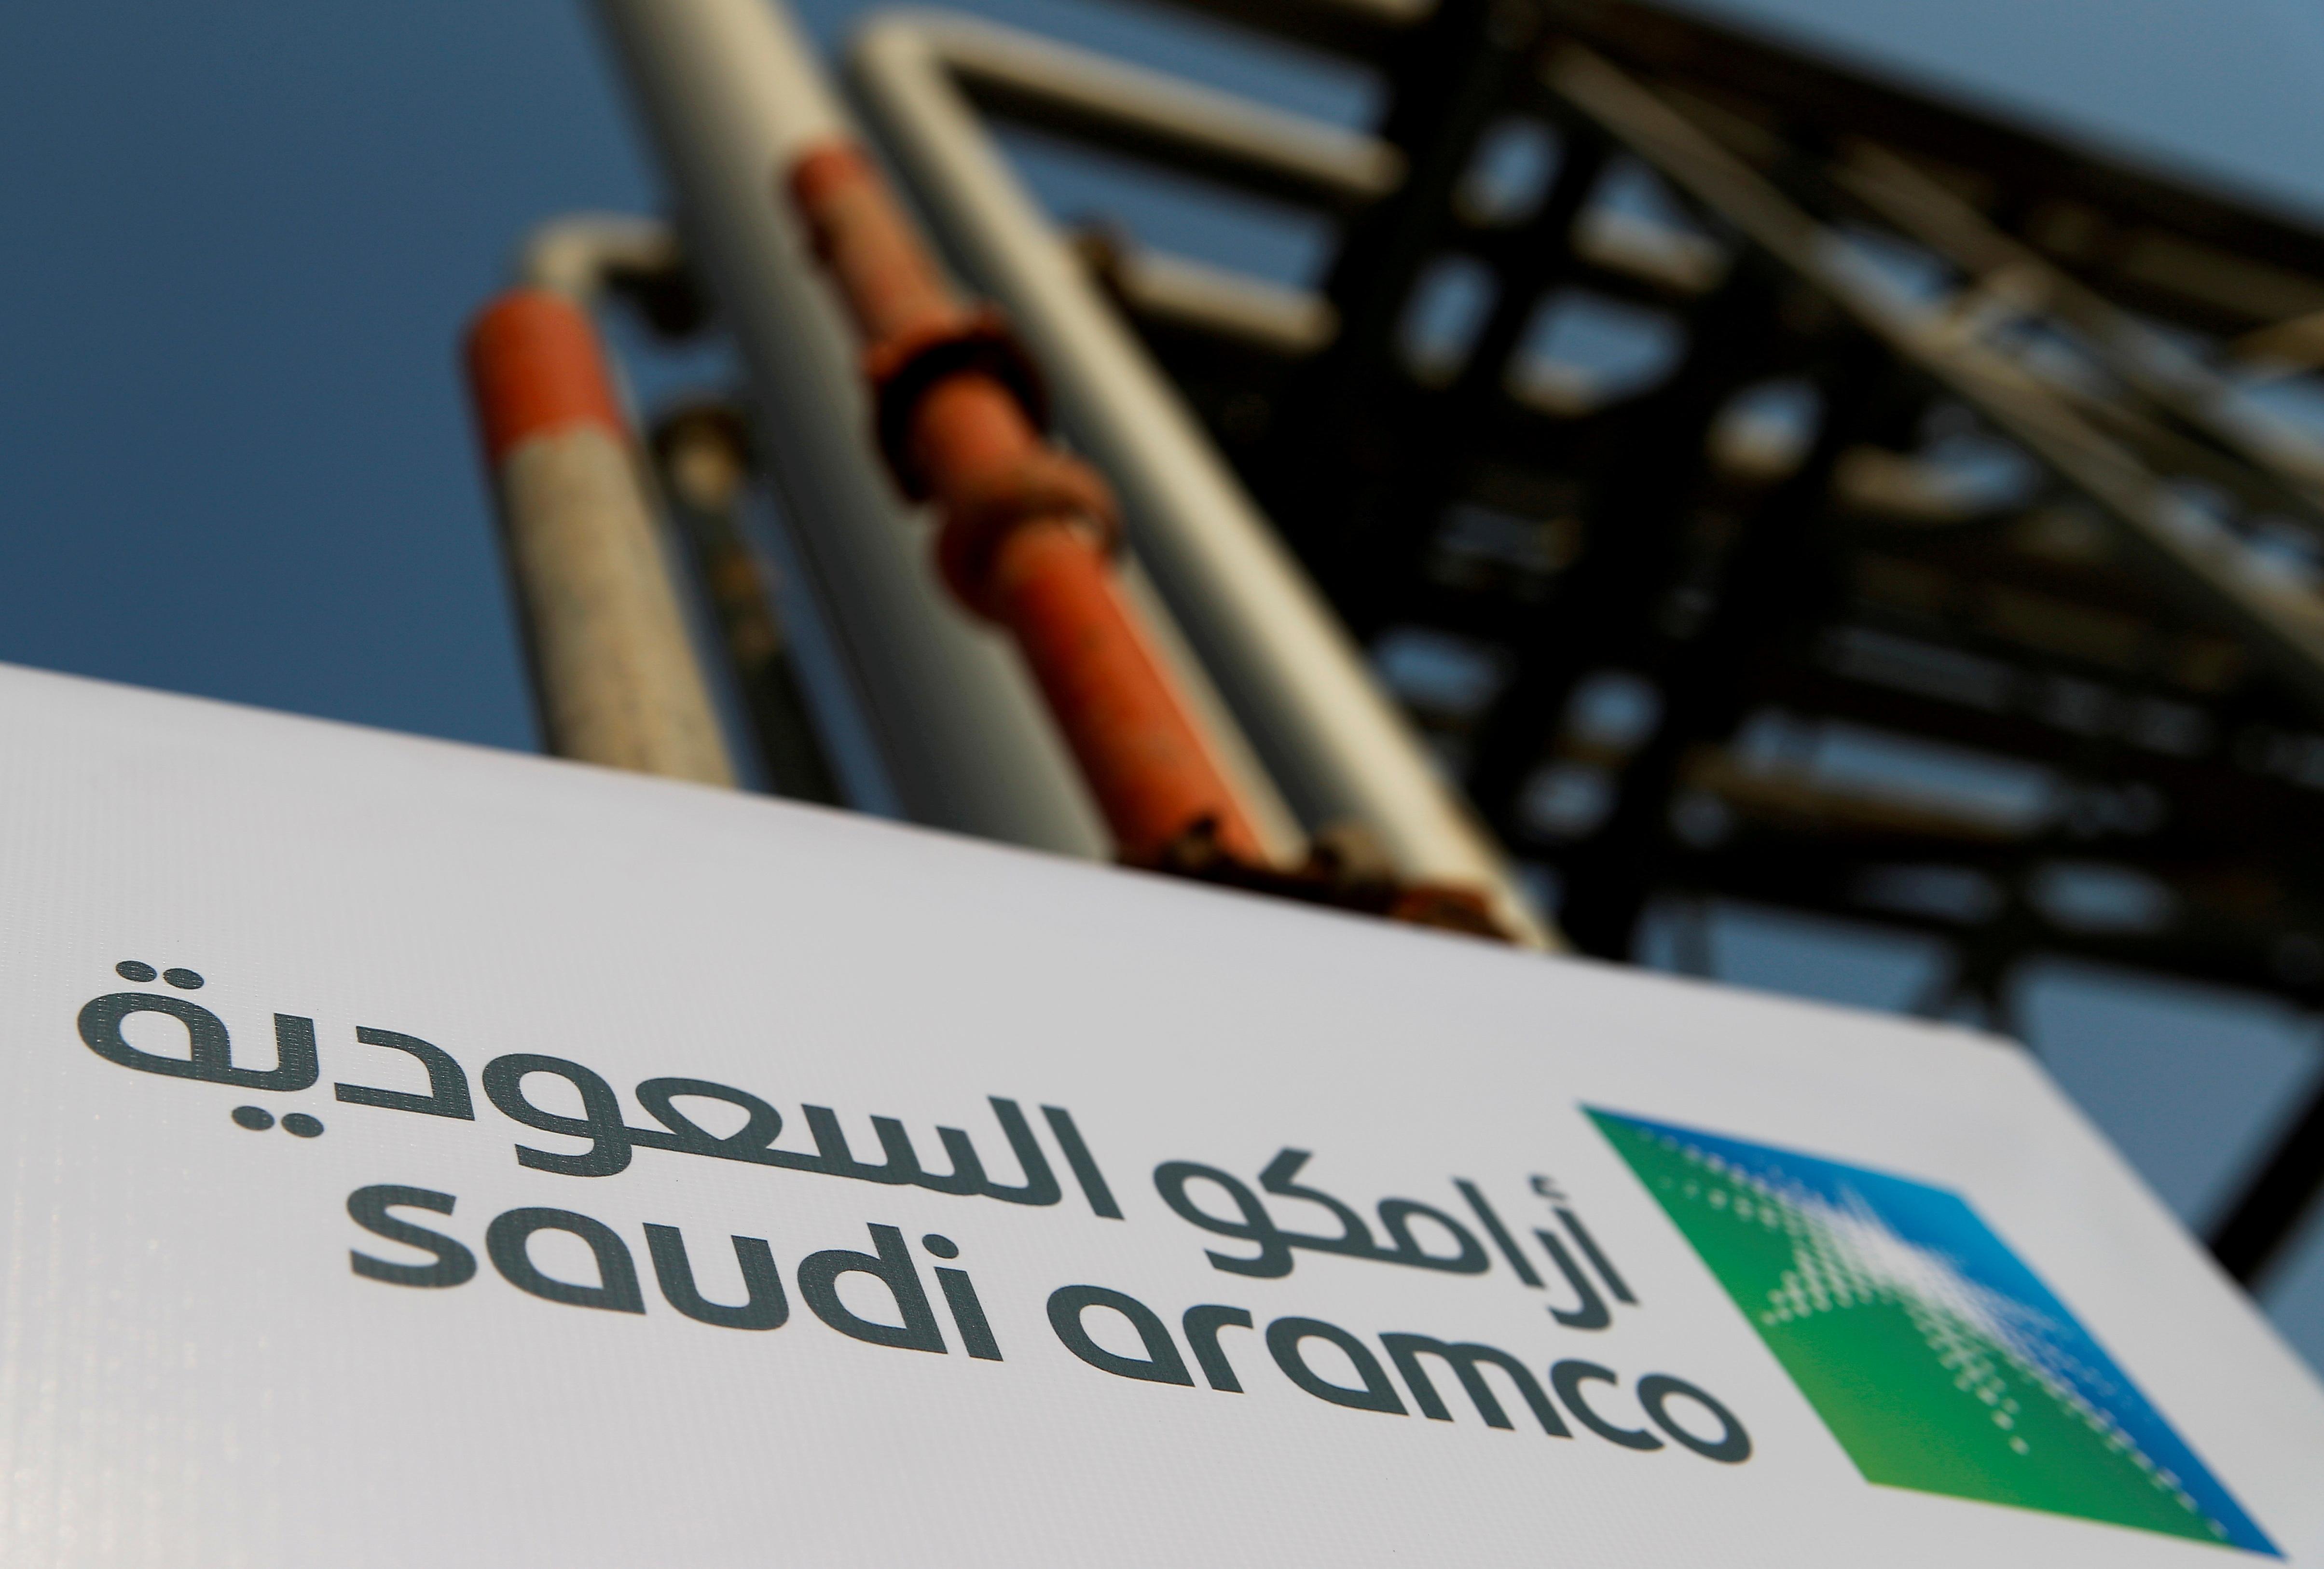 Saudi Aramco logo is pictured at the oil facility in Abqaiq, Saudi Arabia October 12, 2019. REUTERS/Maxim Shemetov